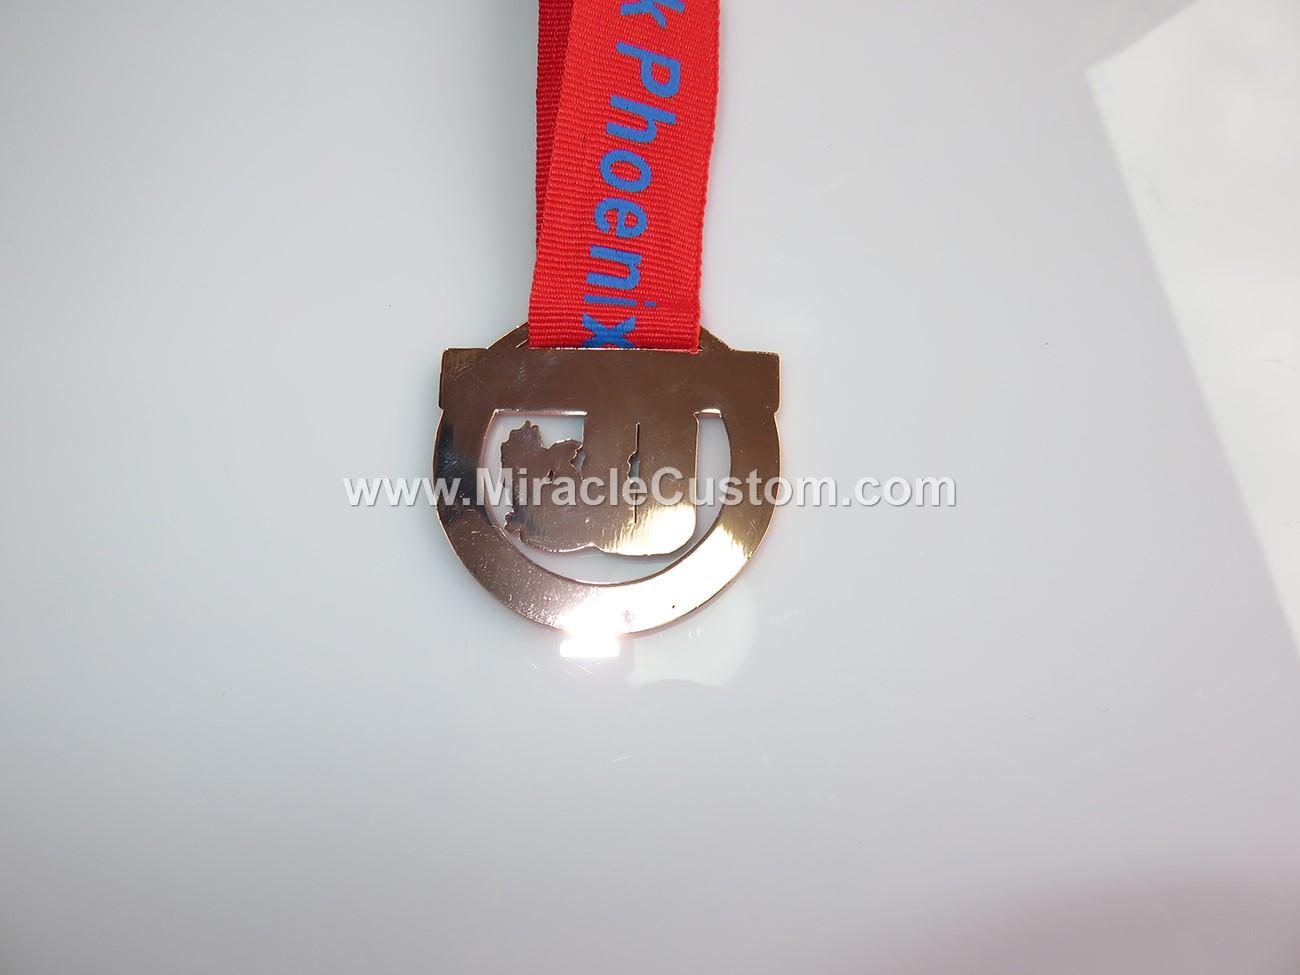 custom swimming club medals